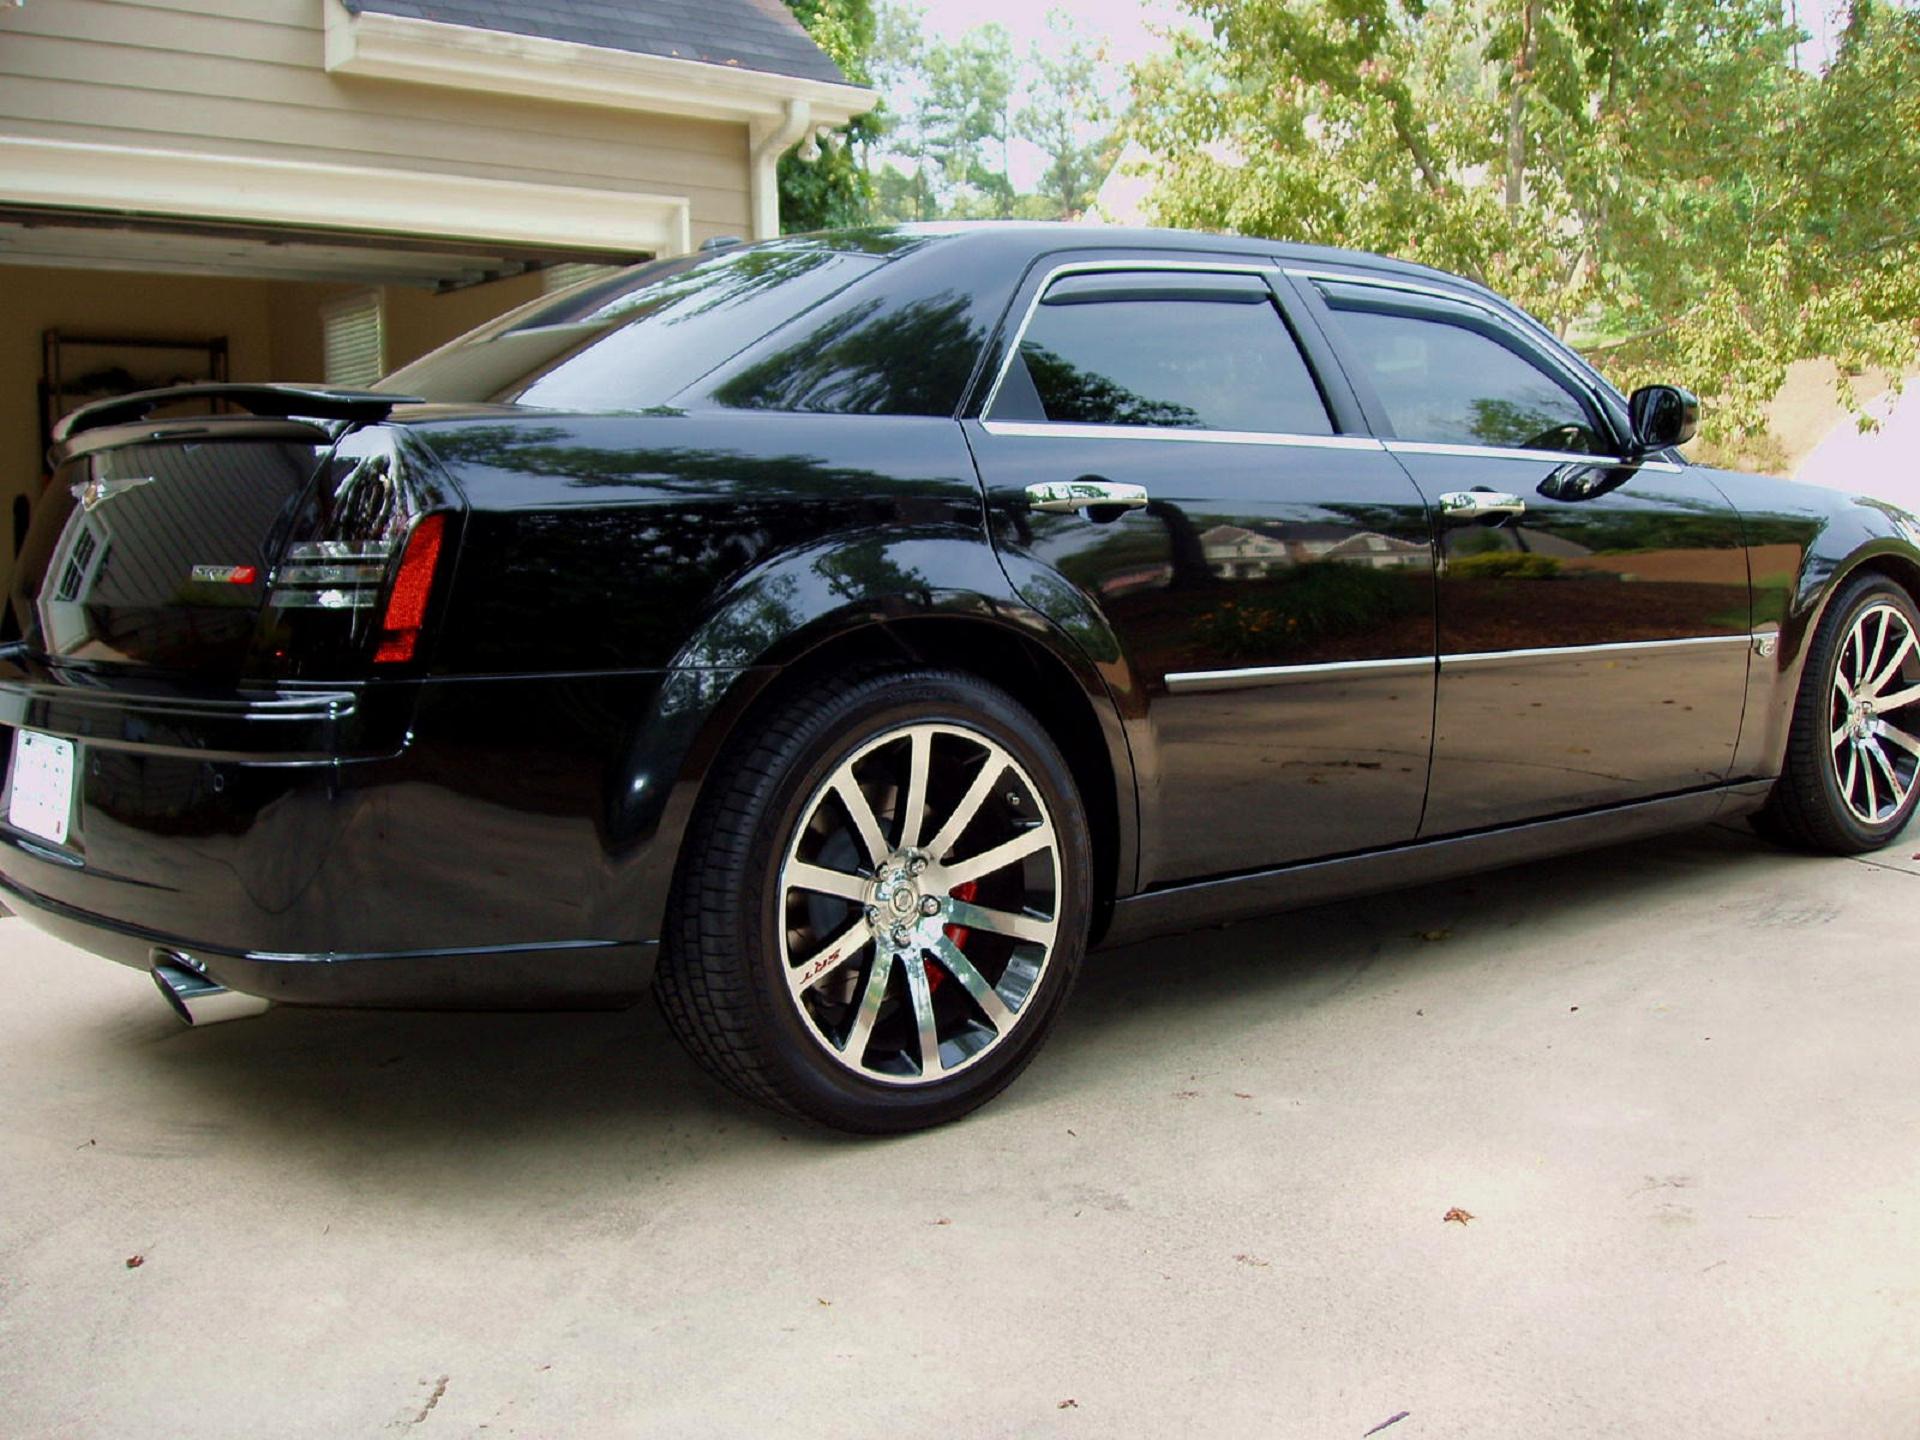 Chrysler 300 Widescreen